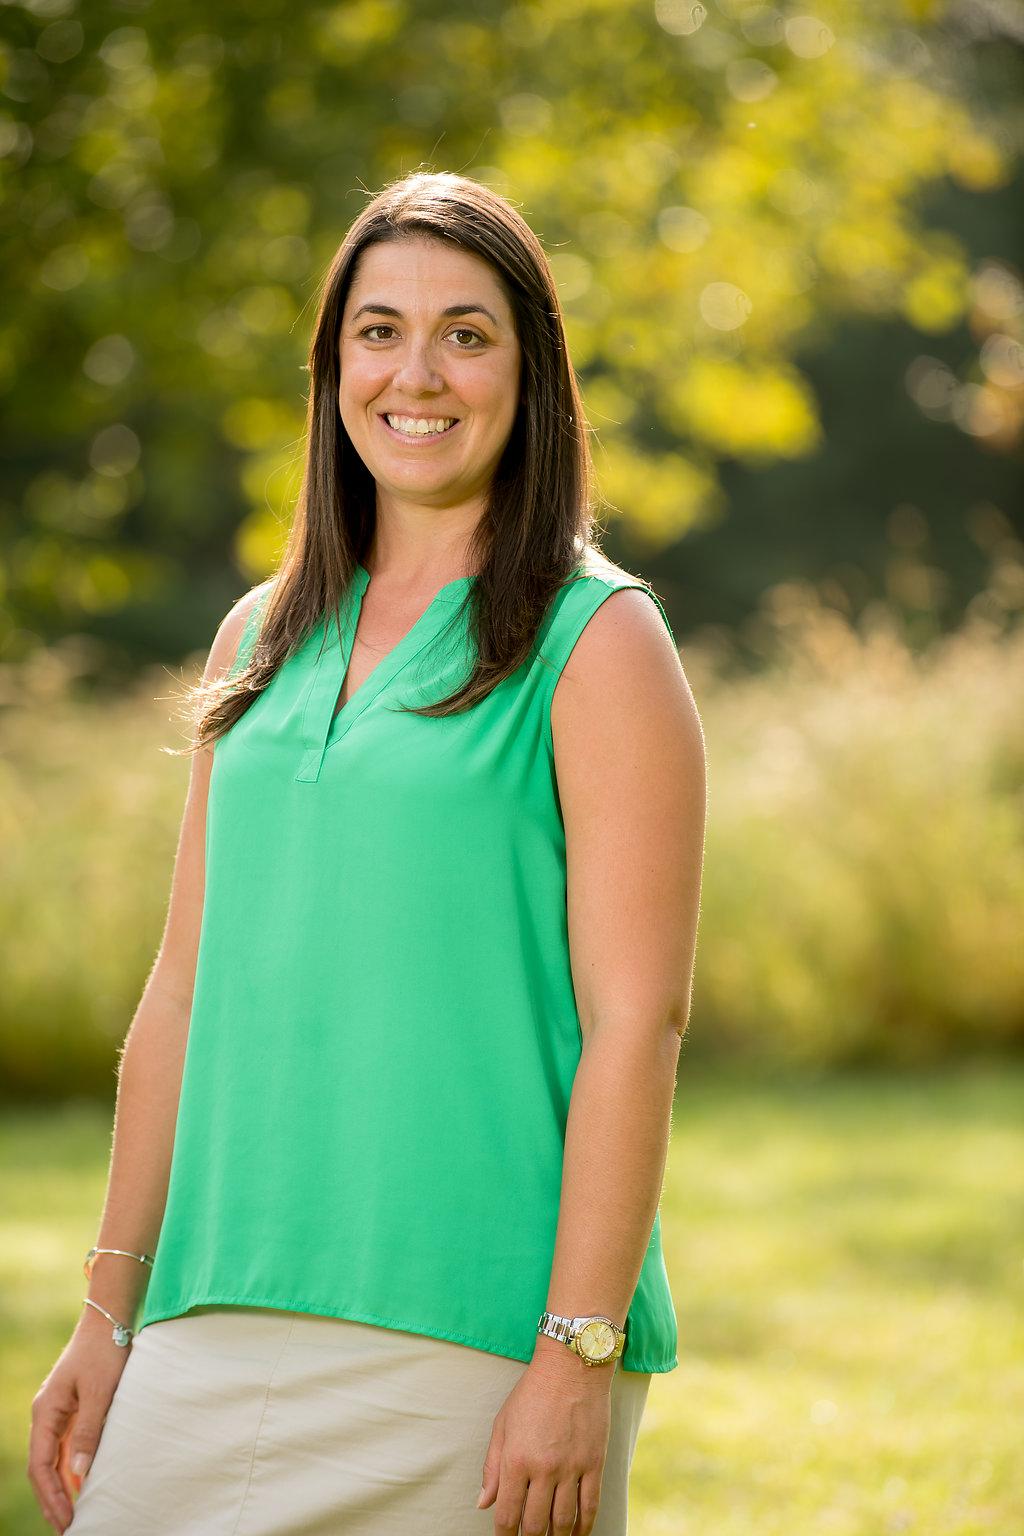 Pine Cobble School Beginners Teacher - Nicole LeBeau